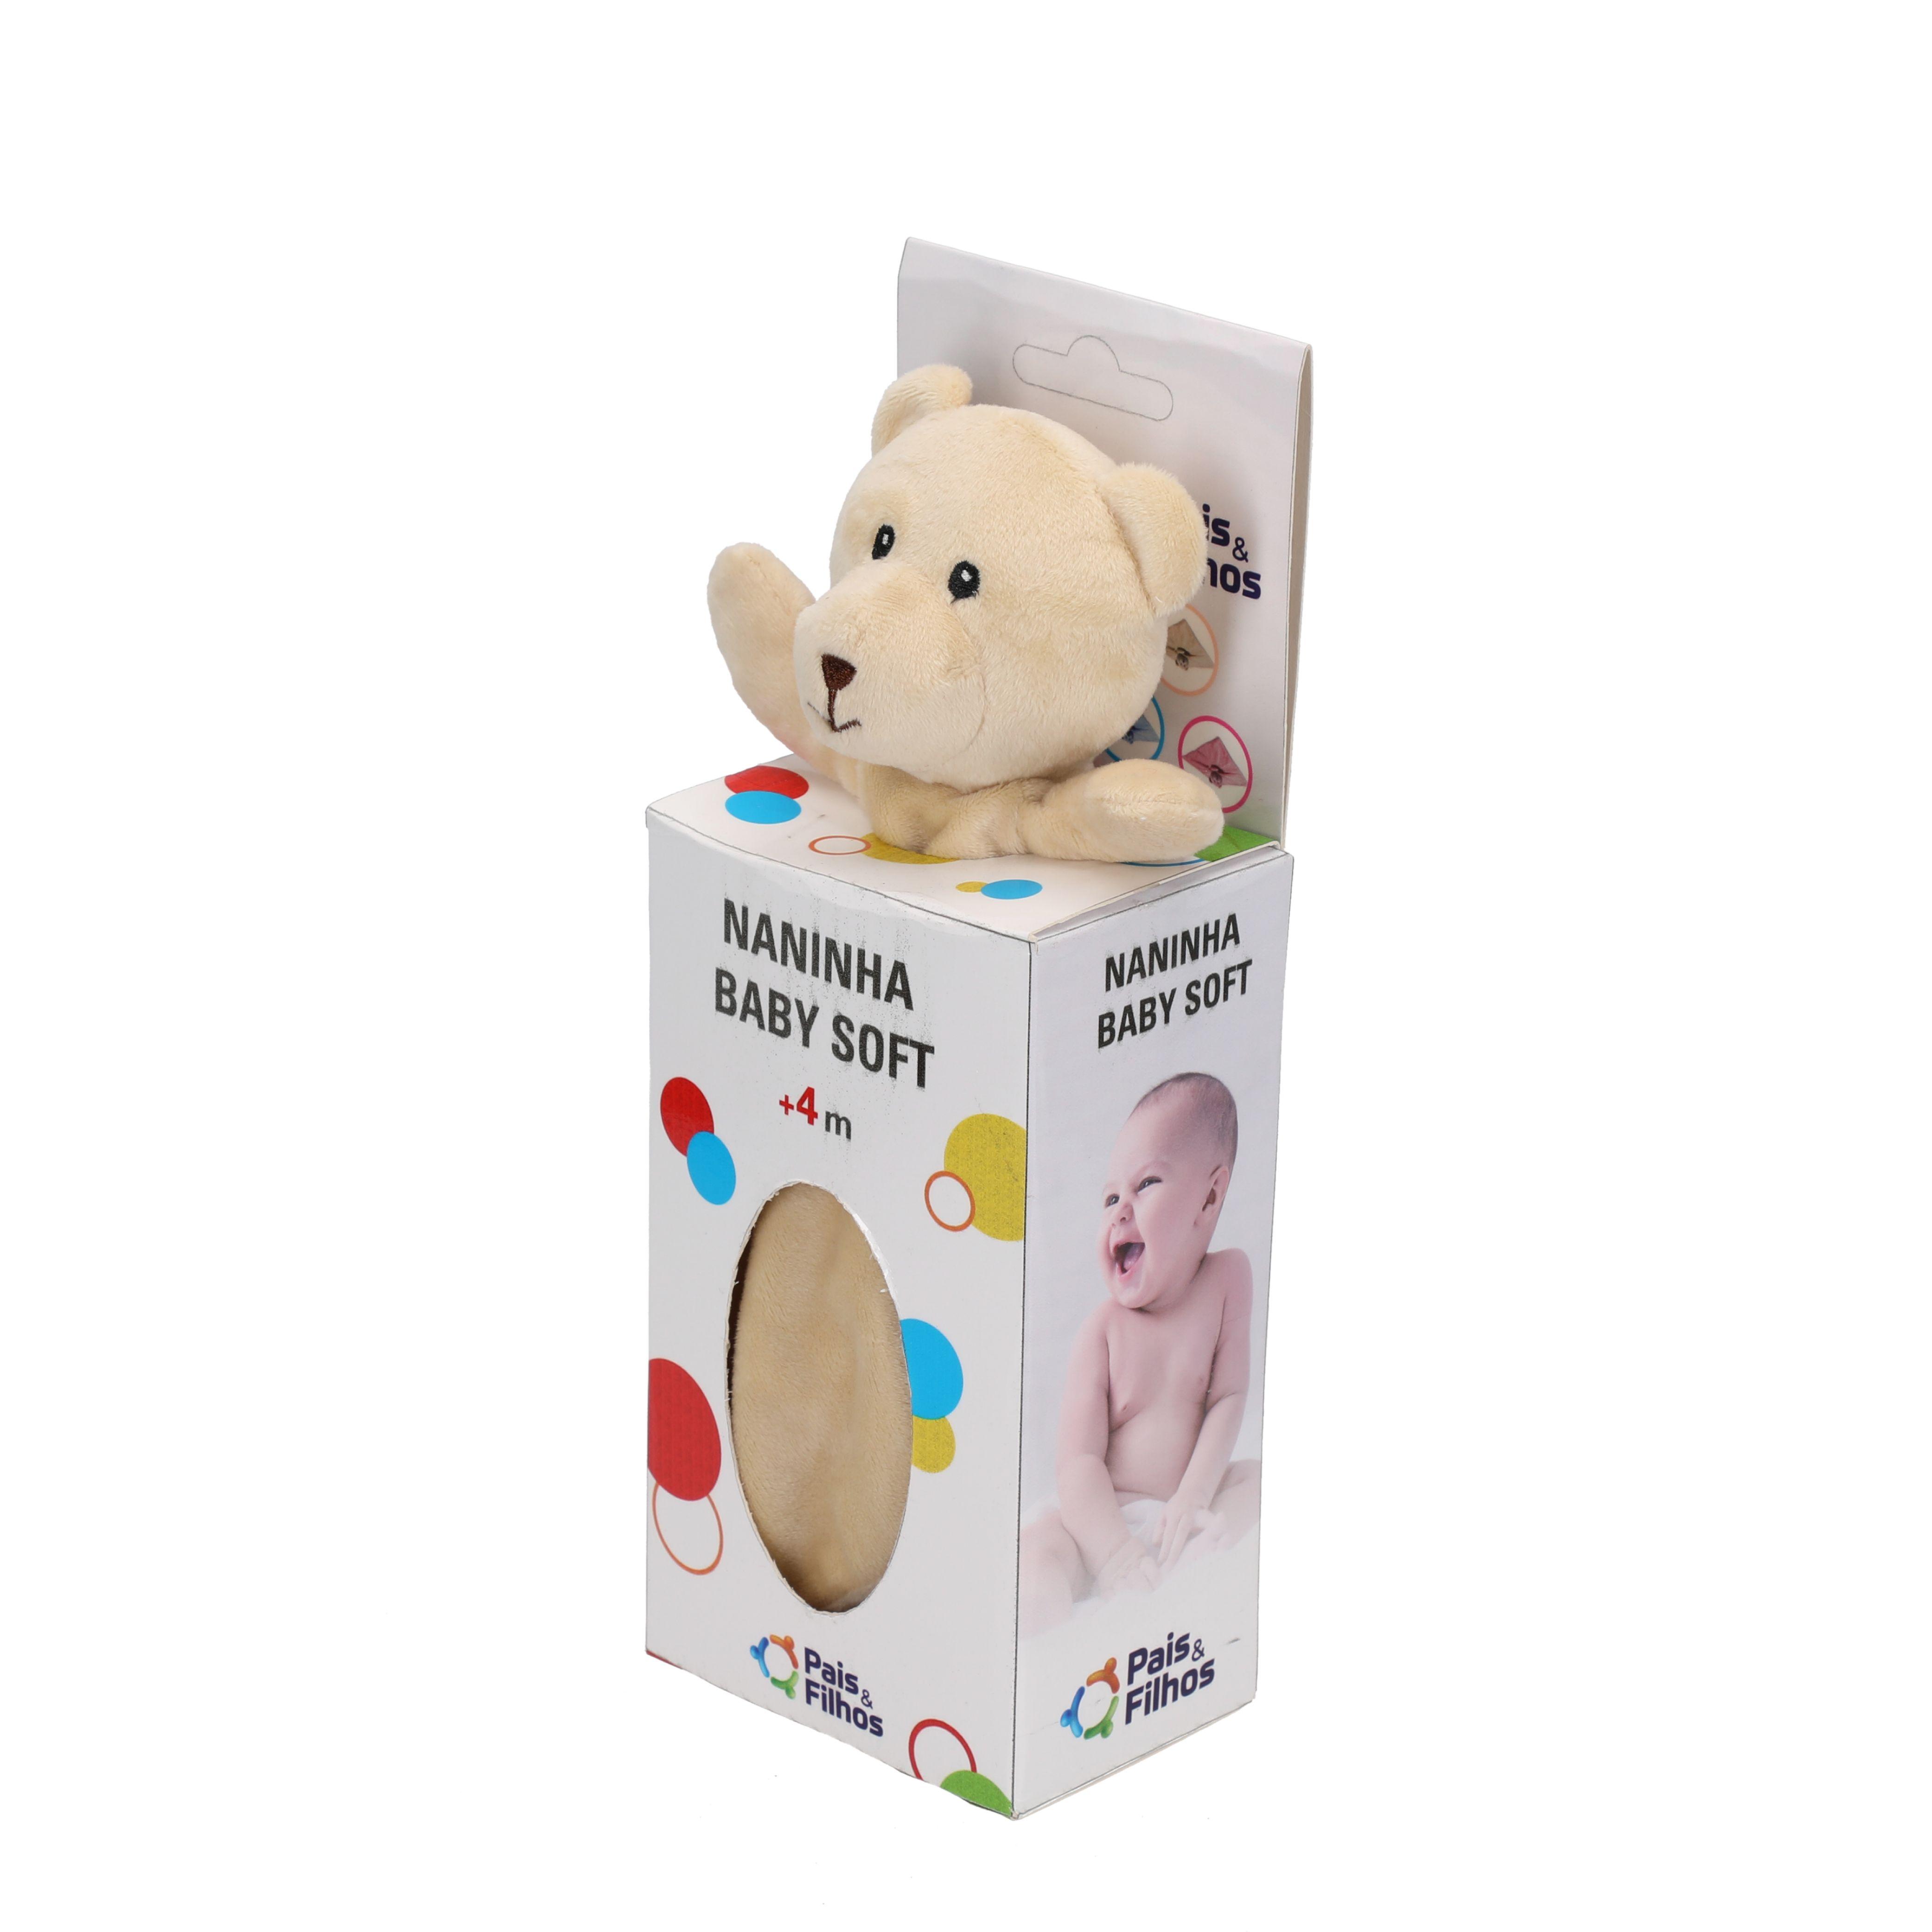 Naninha Baby Soft - Bege-15090